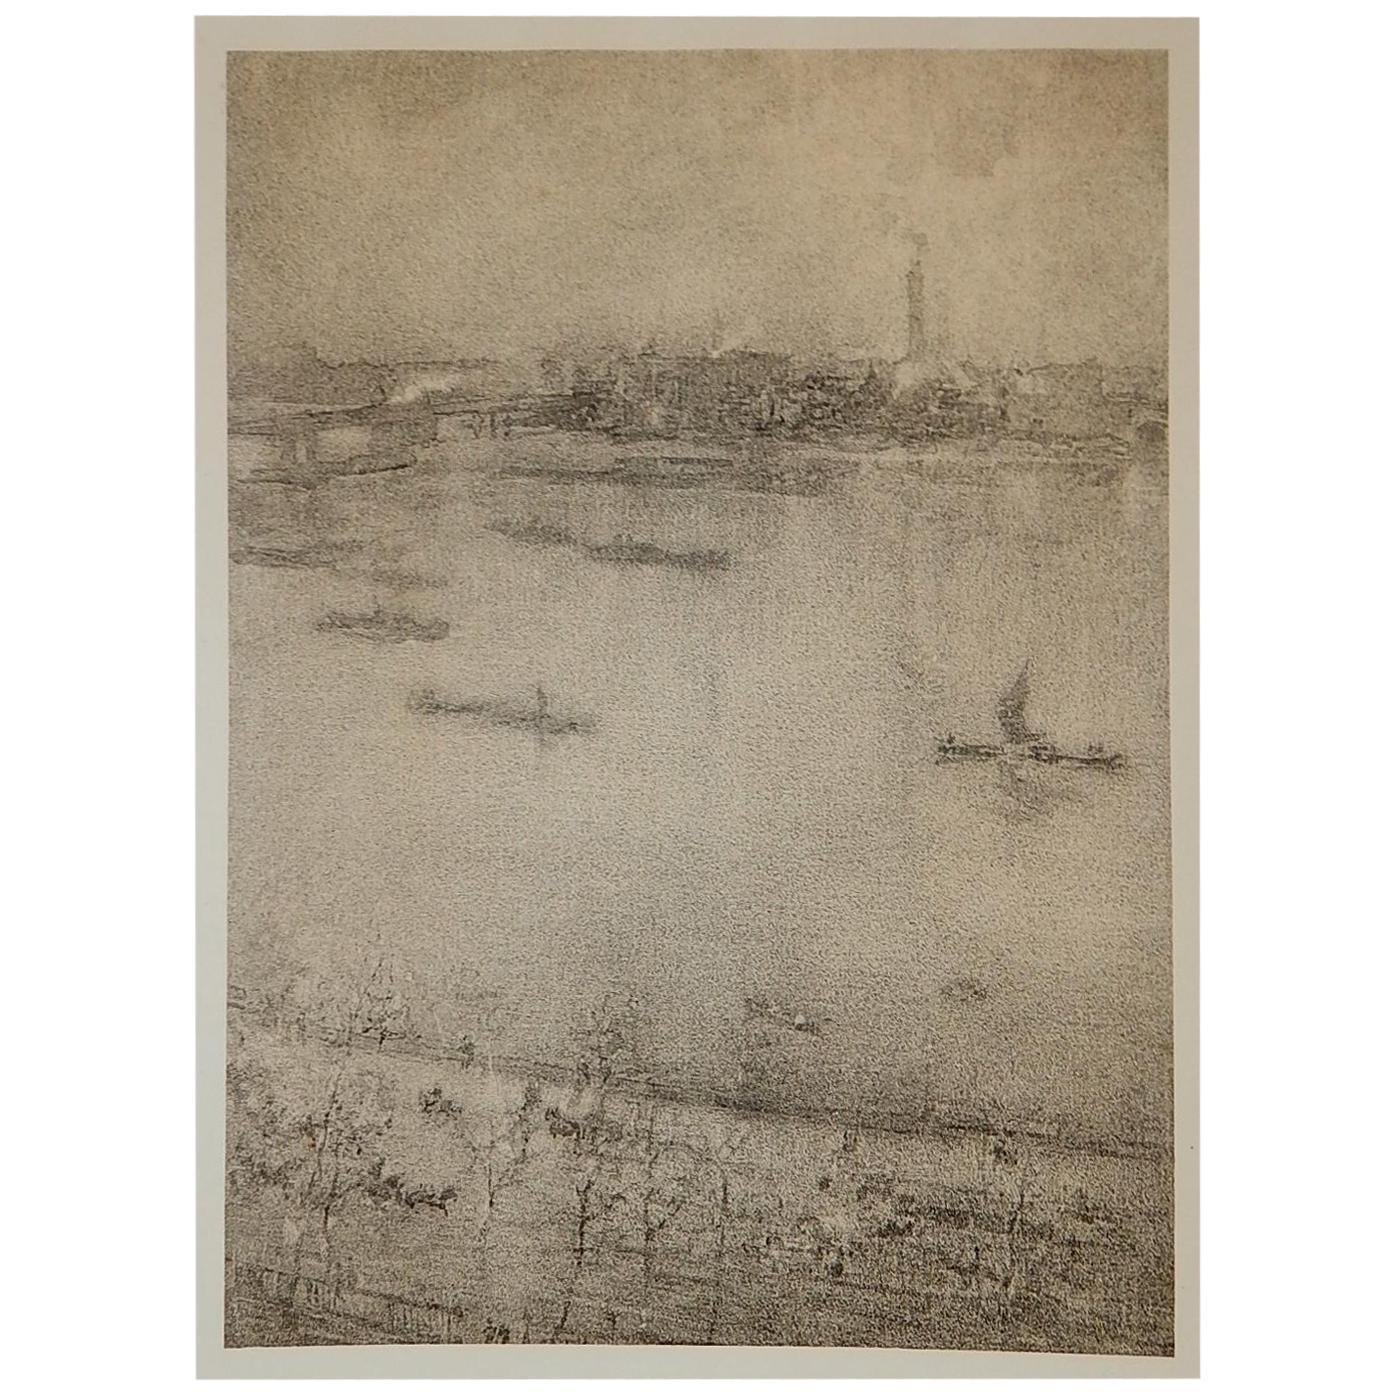 James Abbott McNeill Whister Lithotint, 1896, The Thames